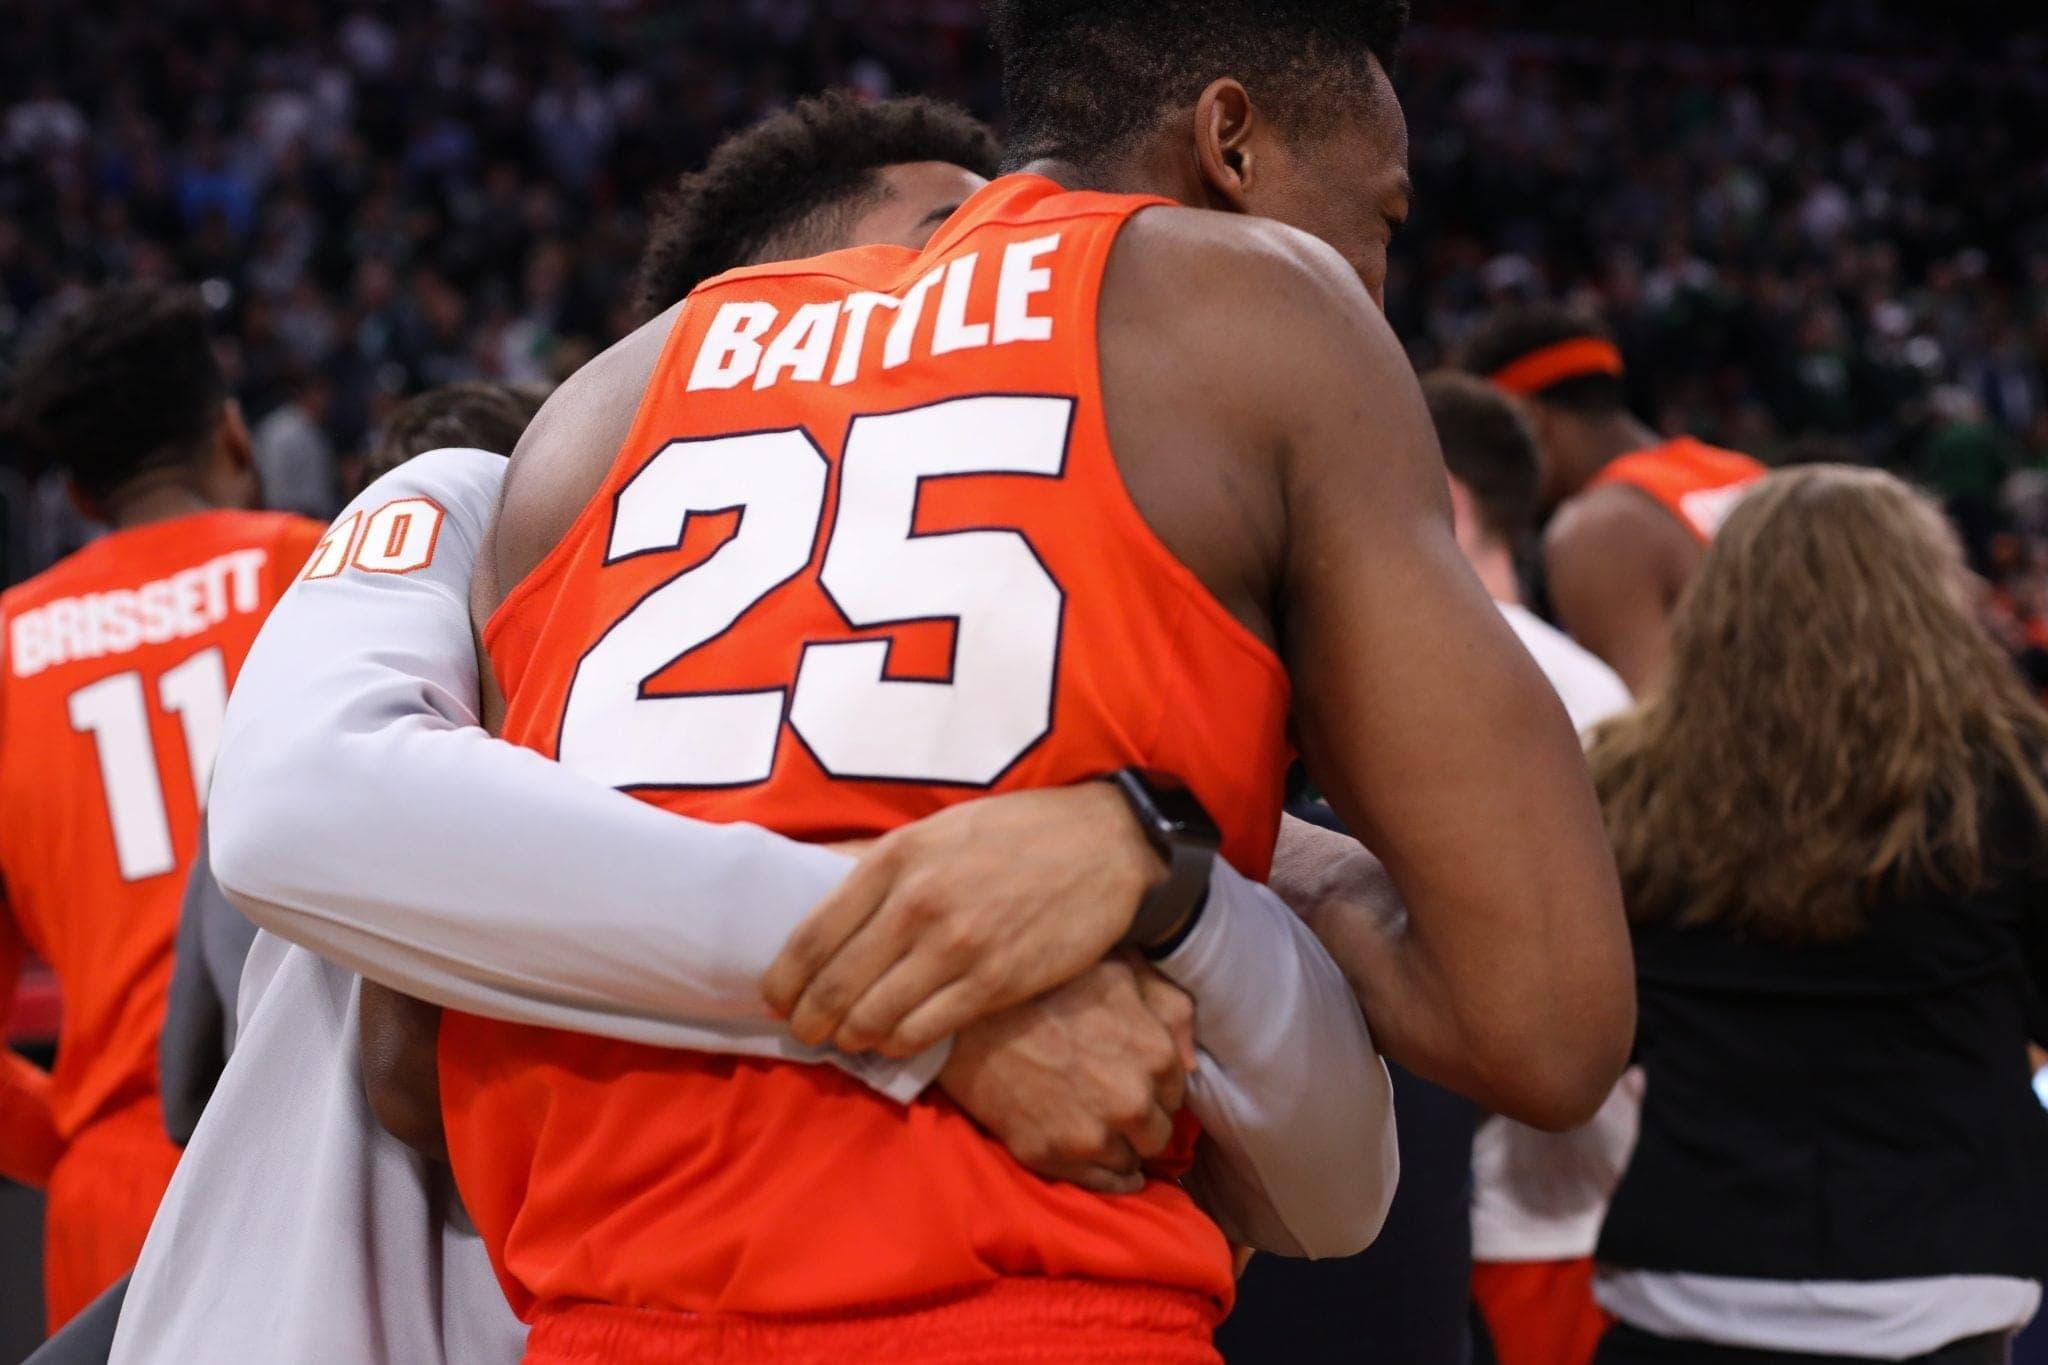 SU vs. Michigan State: Howard Washington hugs Tyus Battle